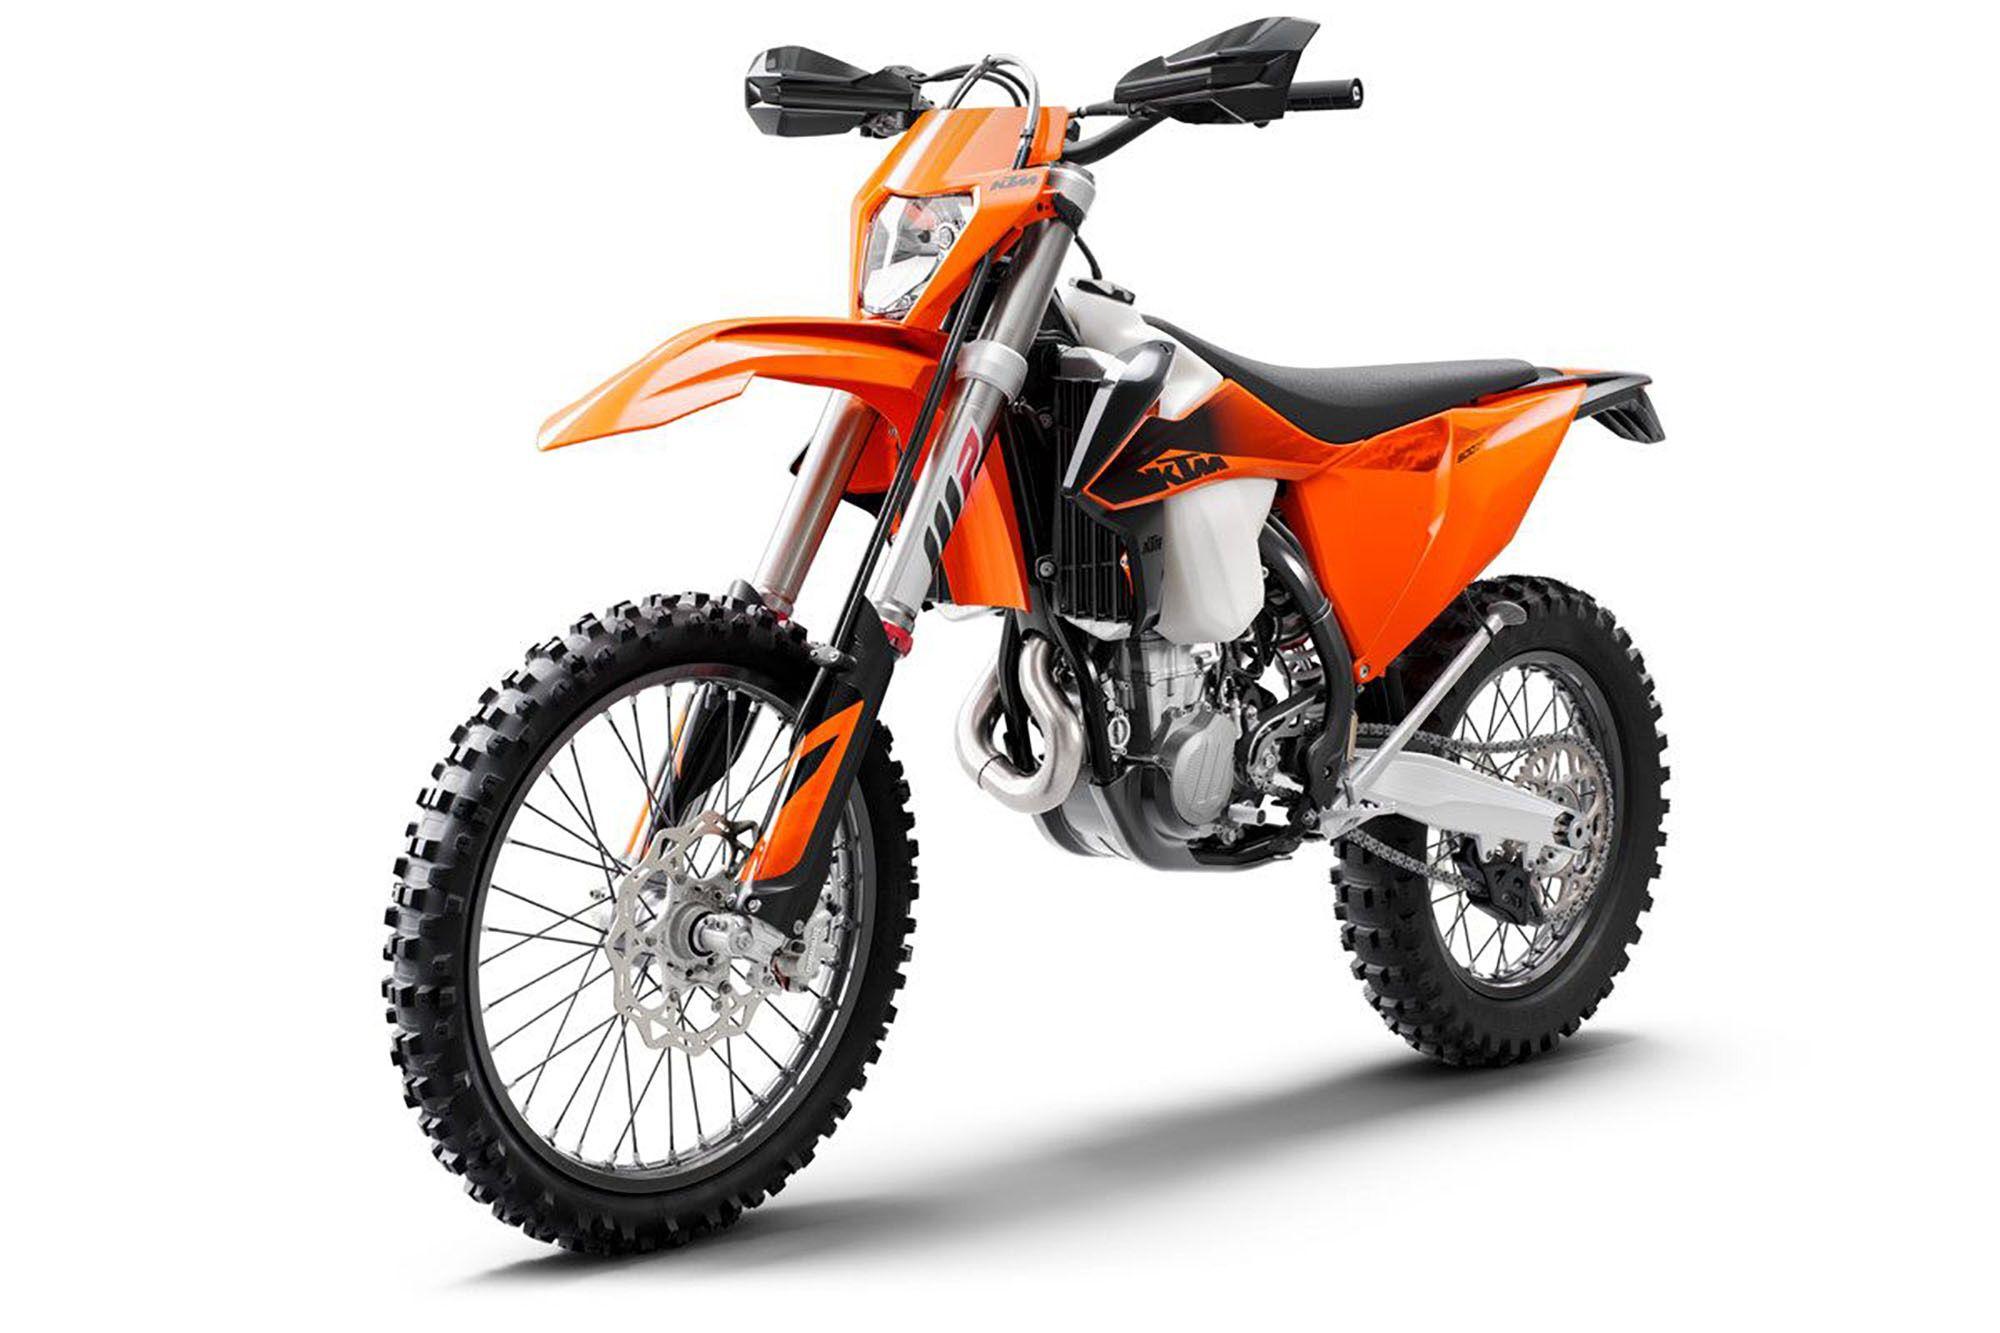 2020 Ktm Enduro Bike S Announced Ktm Enduro Ktm Ktm 300